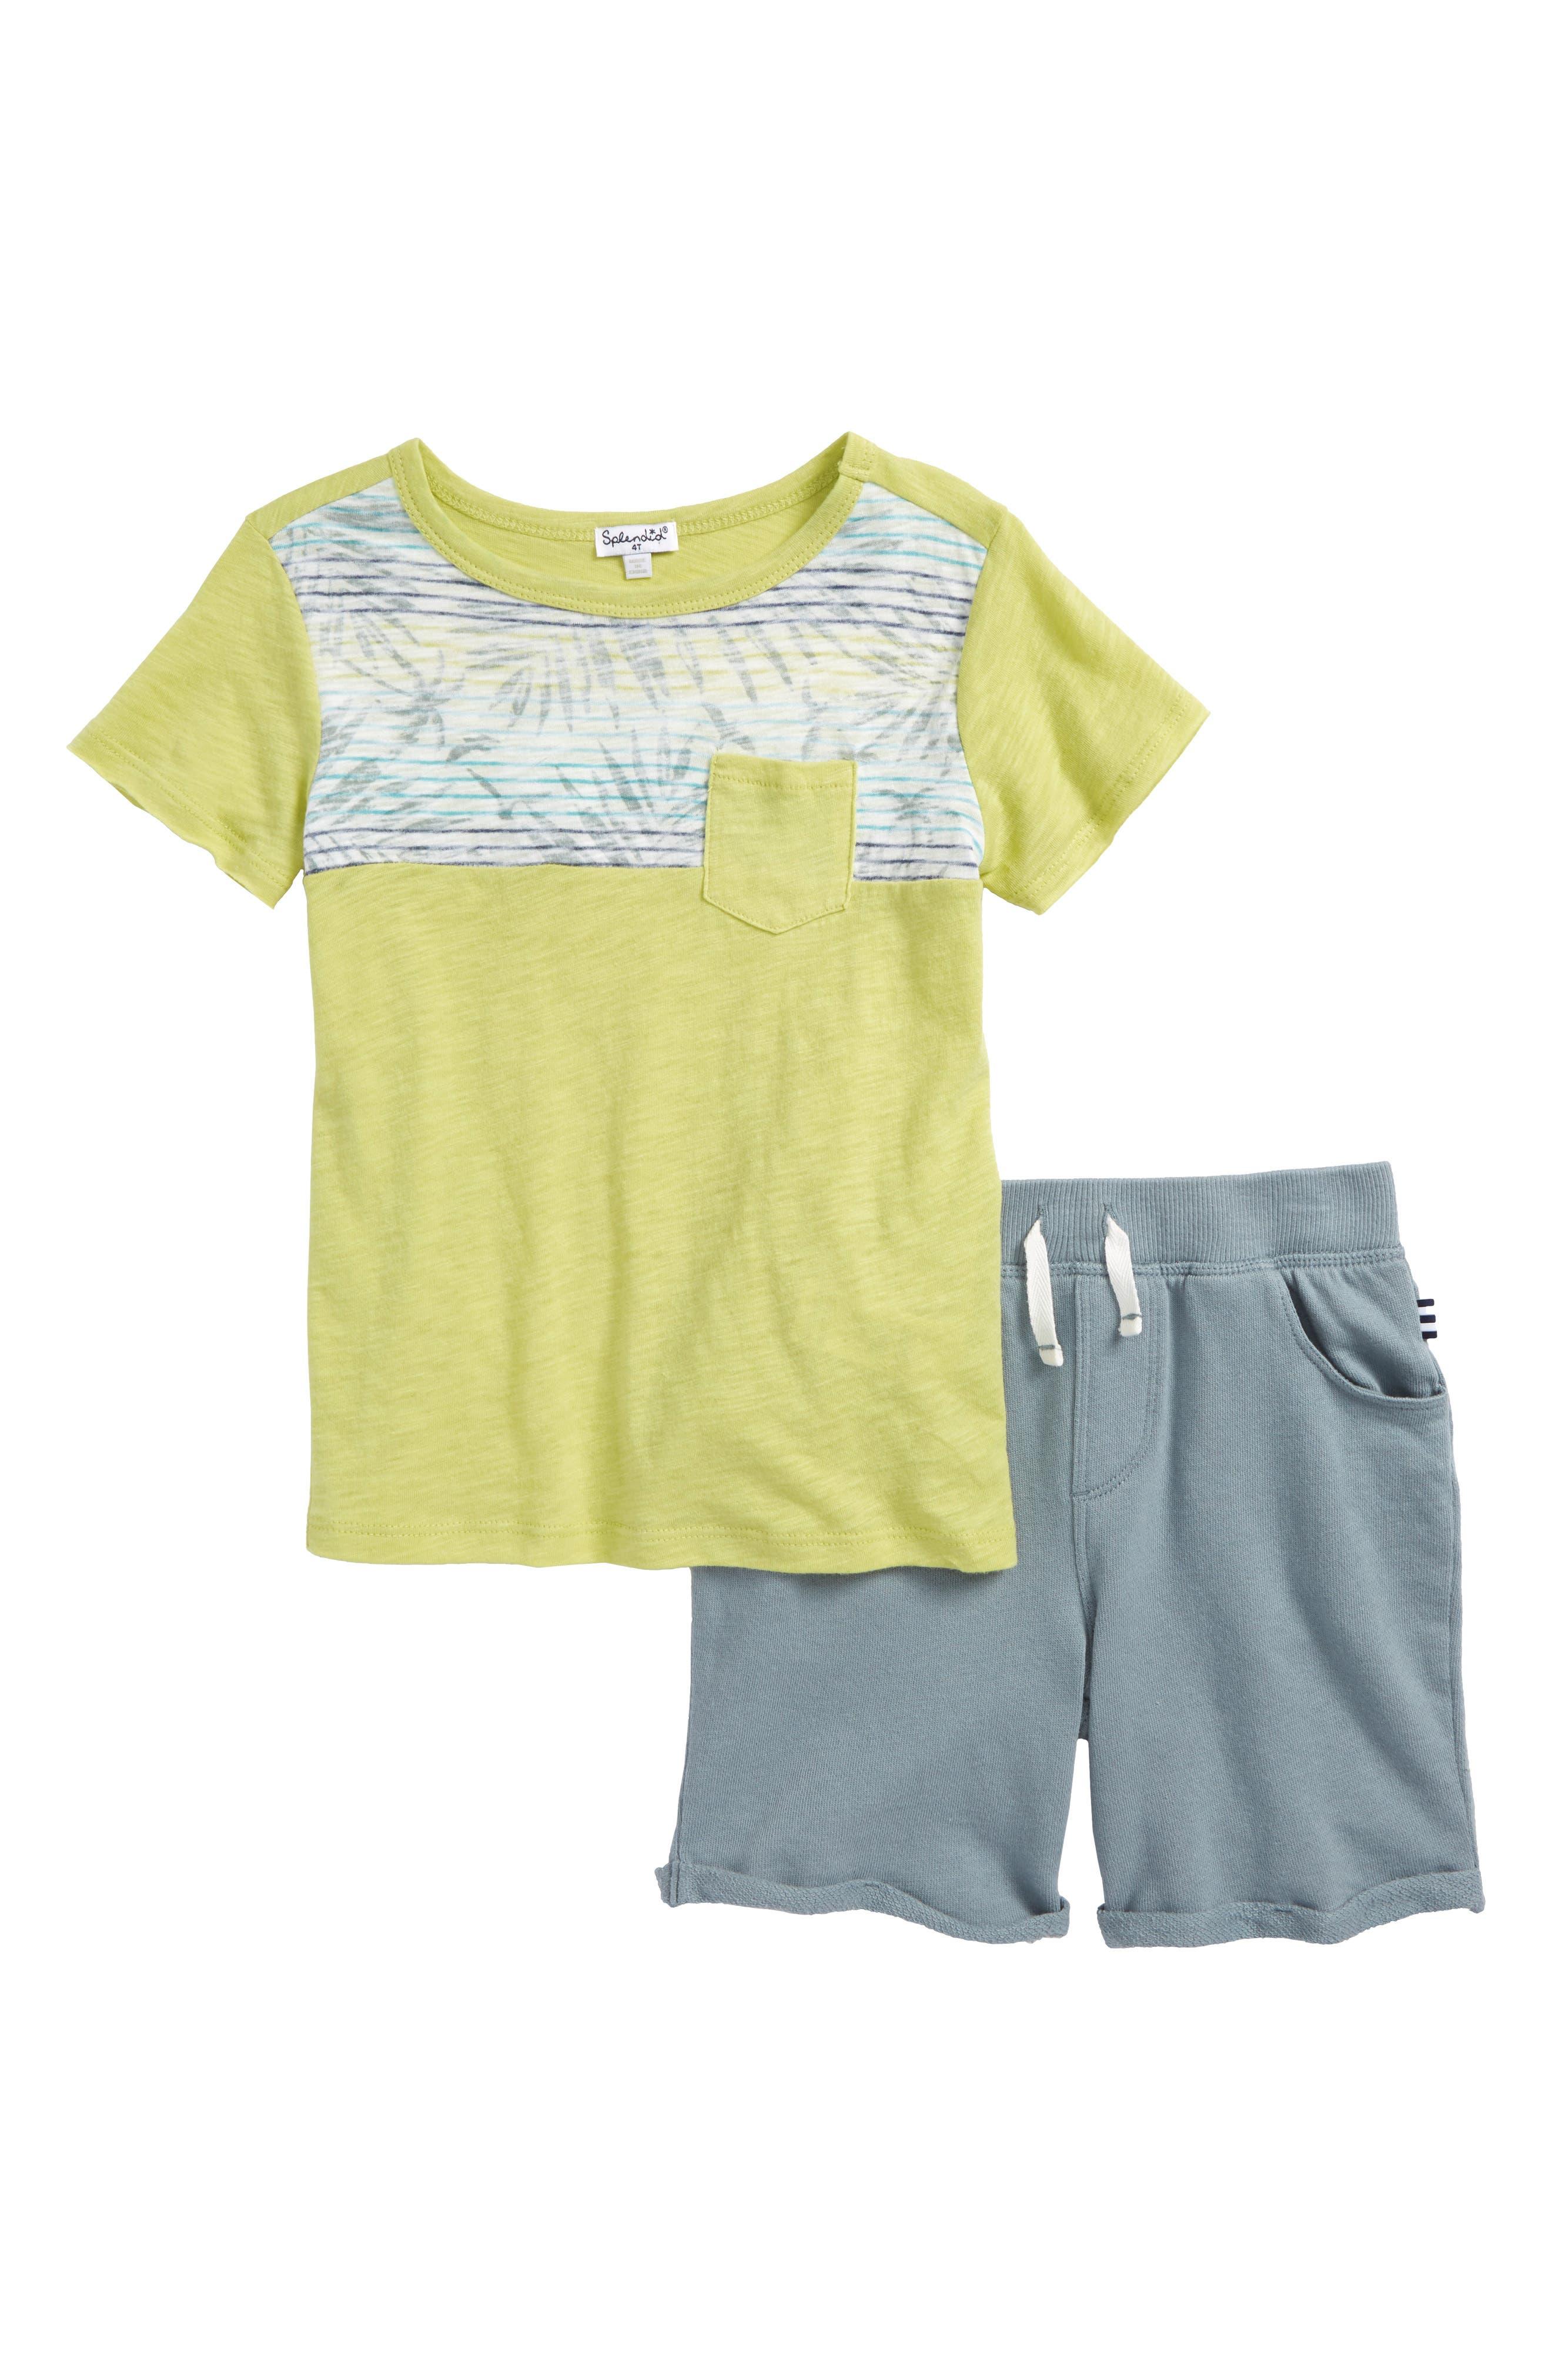 Splendid Reverse Print T-Shirt & Shorts Set (Toddler Boys & Little Boys)